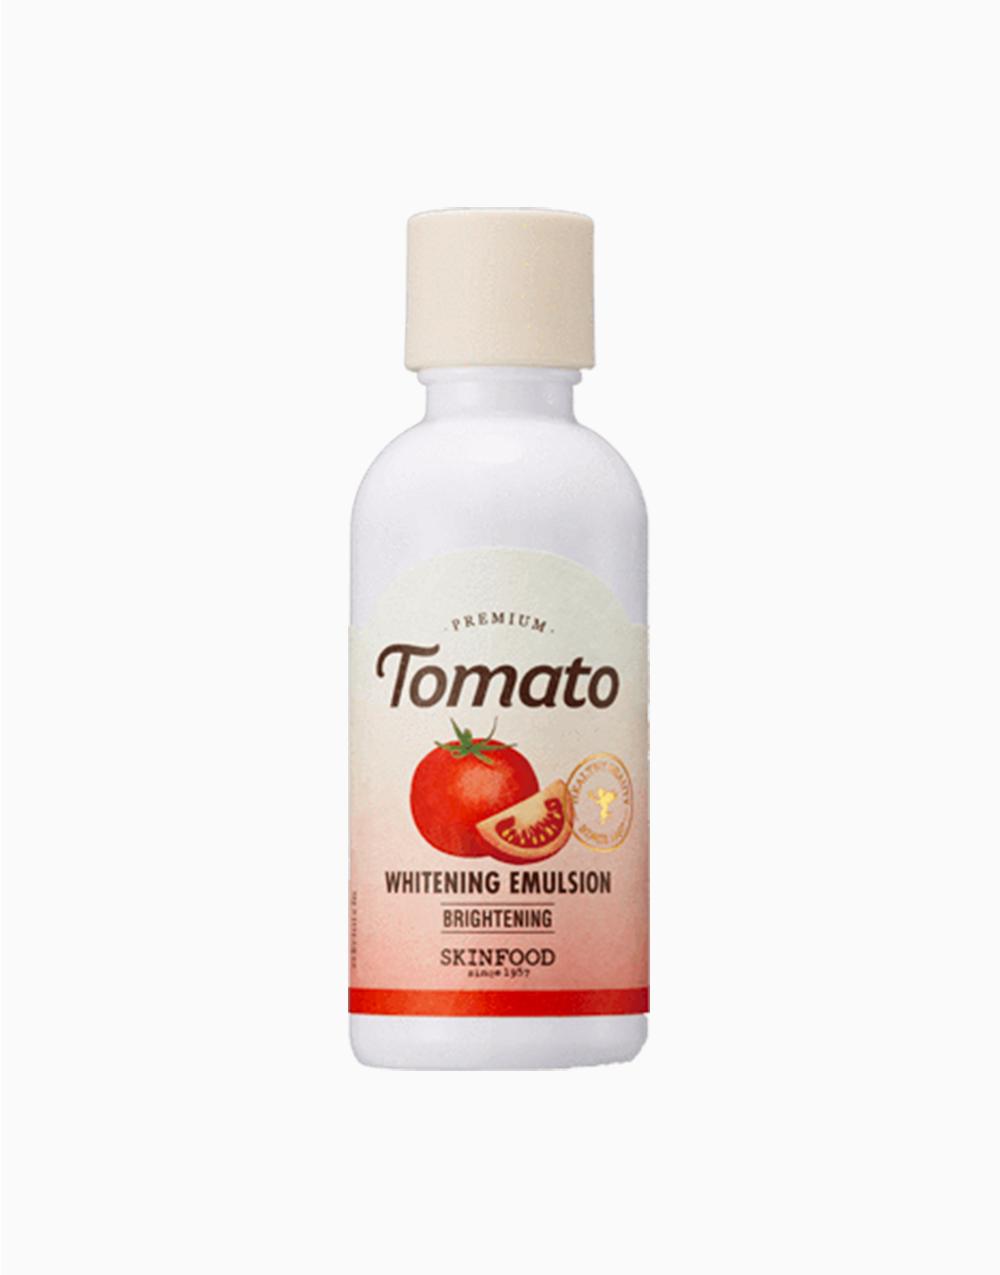 Premium Tomato Whitening Emulsion by Skinfood